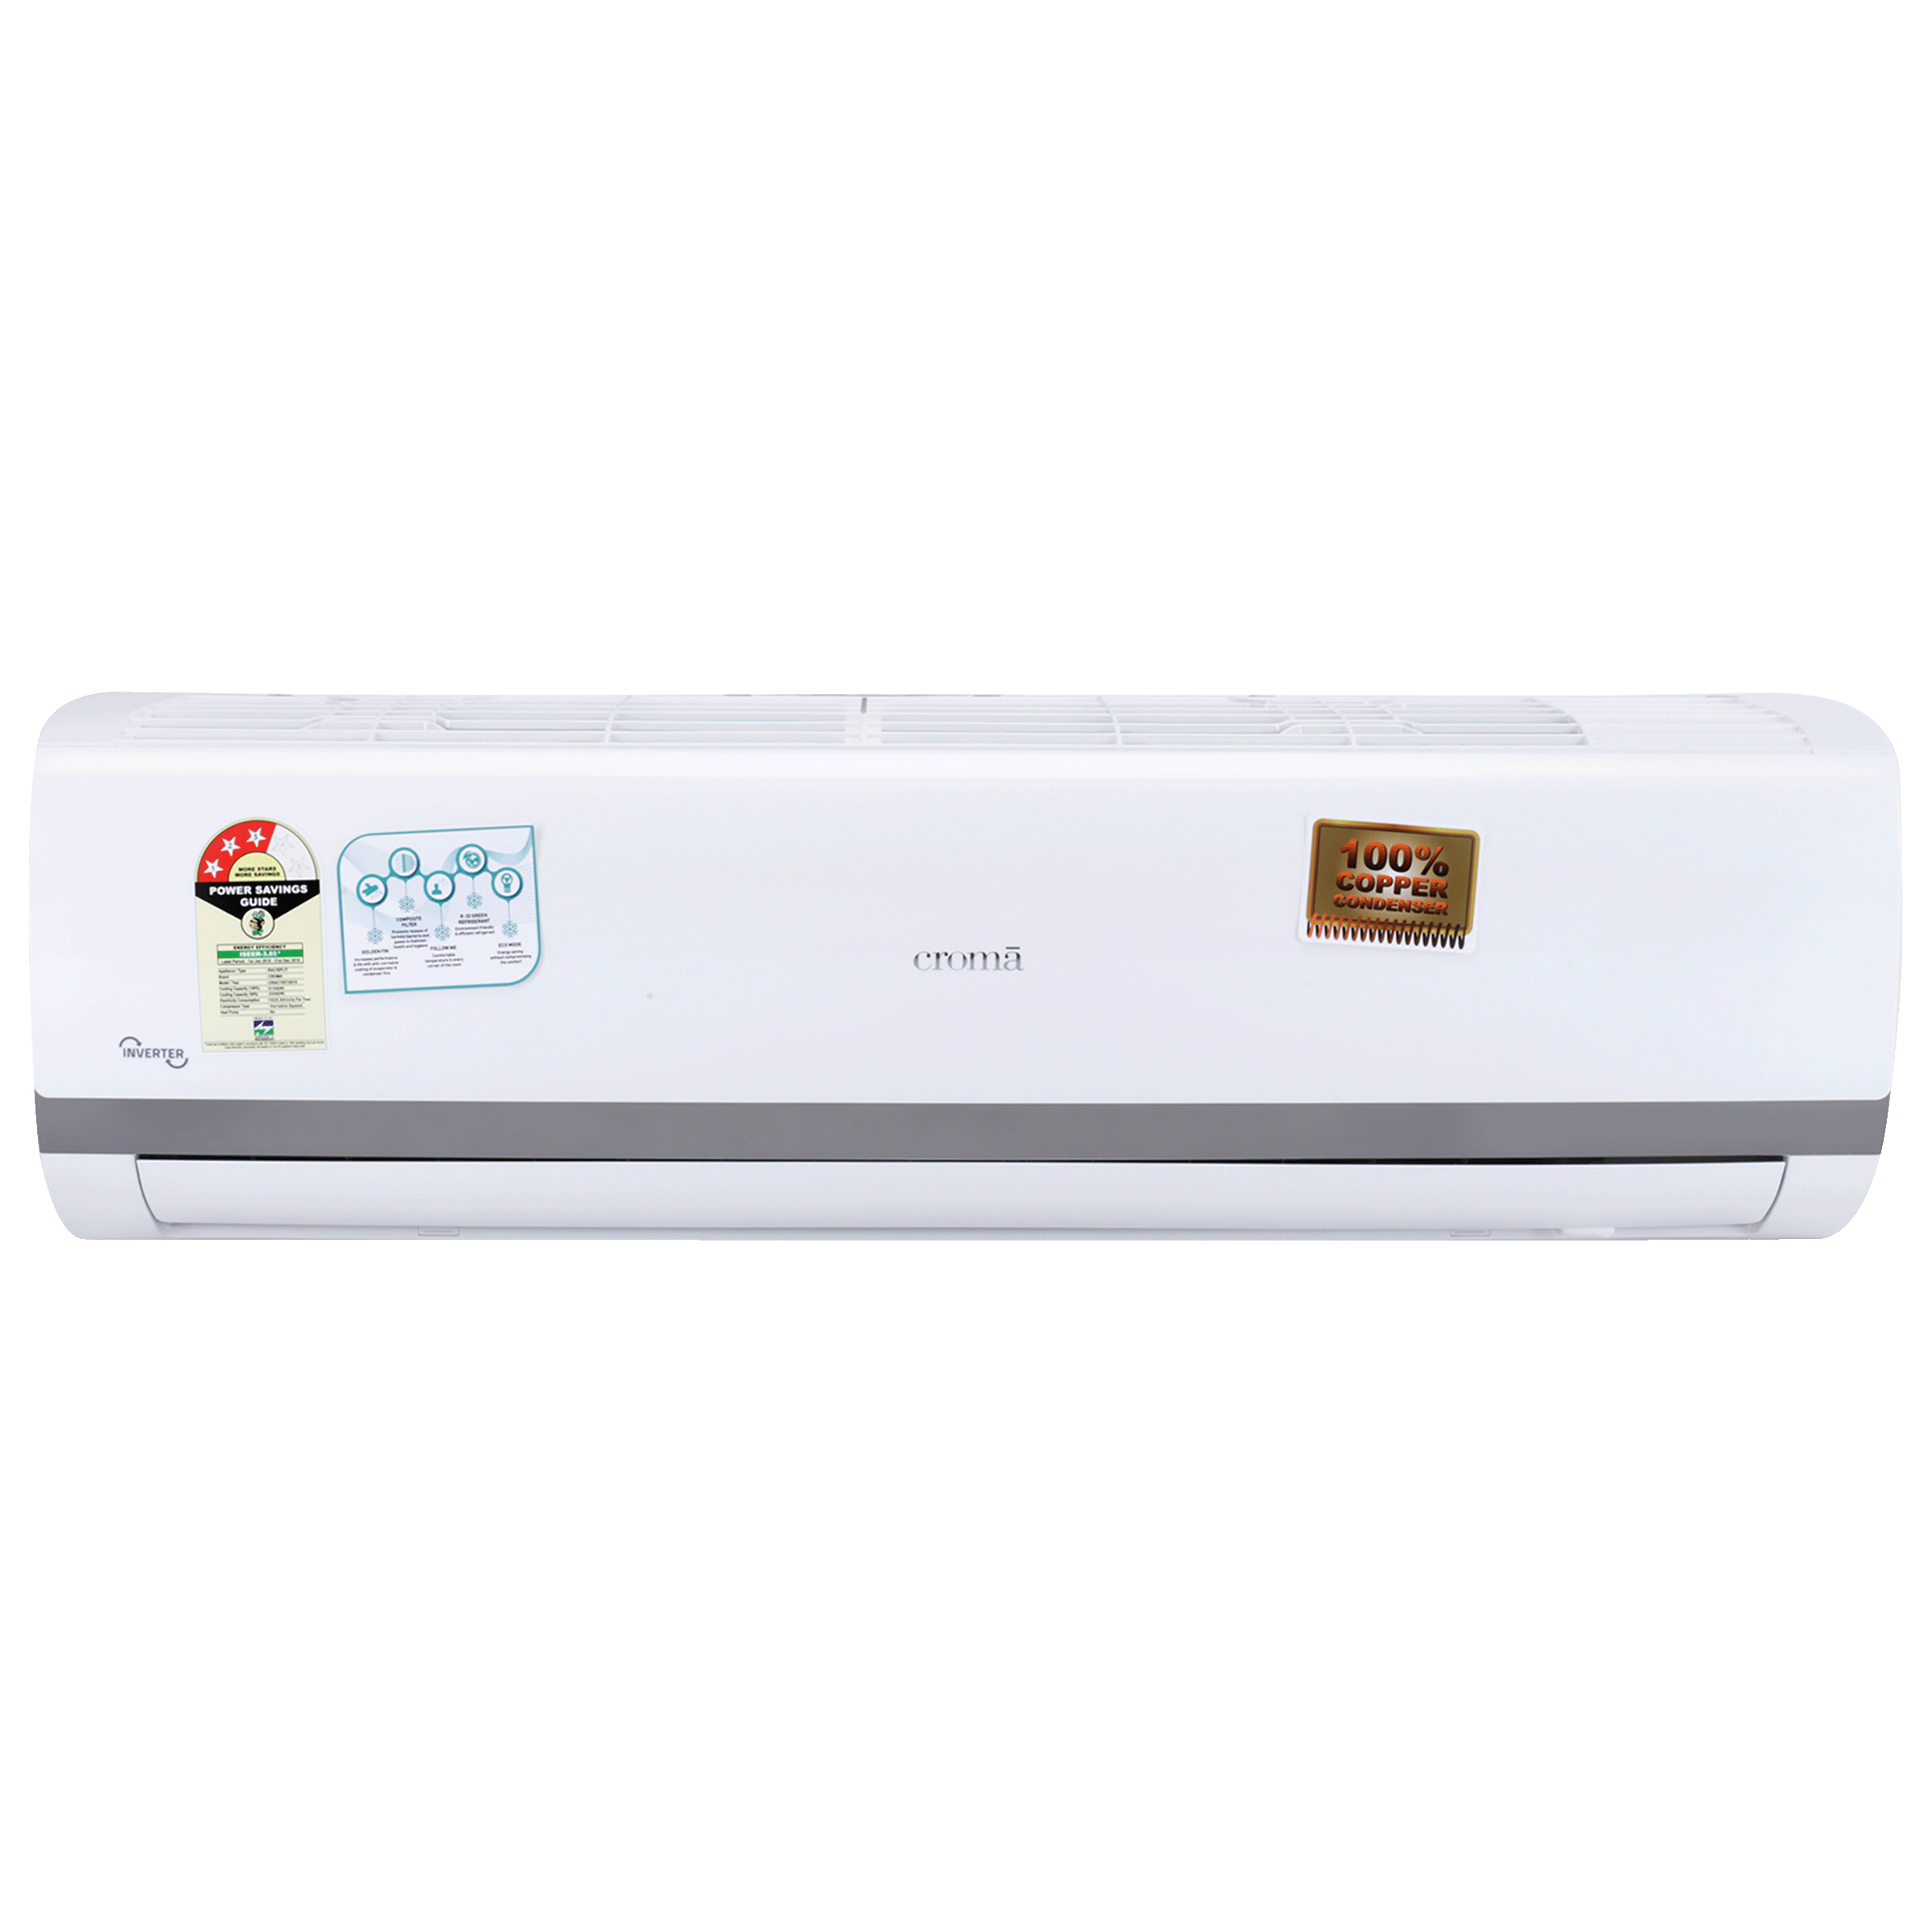 Croma 1.5 Ton 3 Star Inverter Split AC (Copper Condenser, CRAC7557, White/Grey Strip)_1